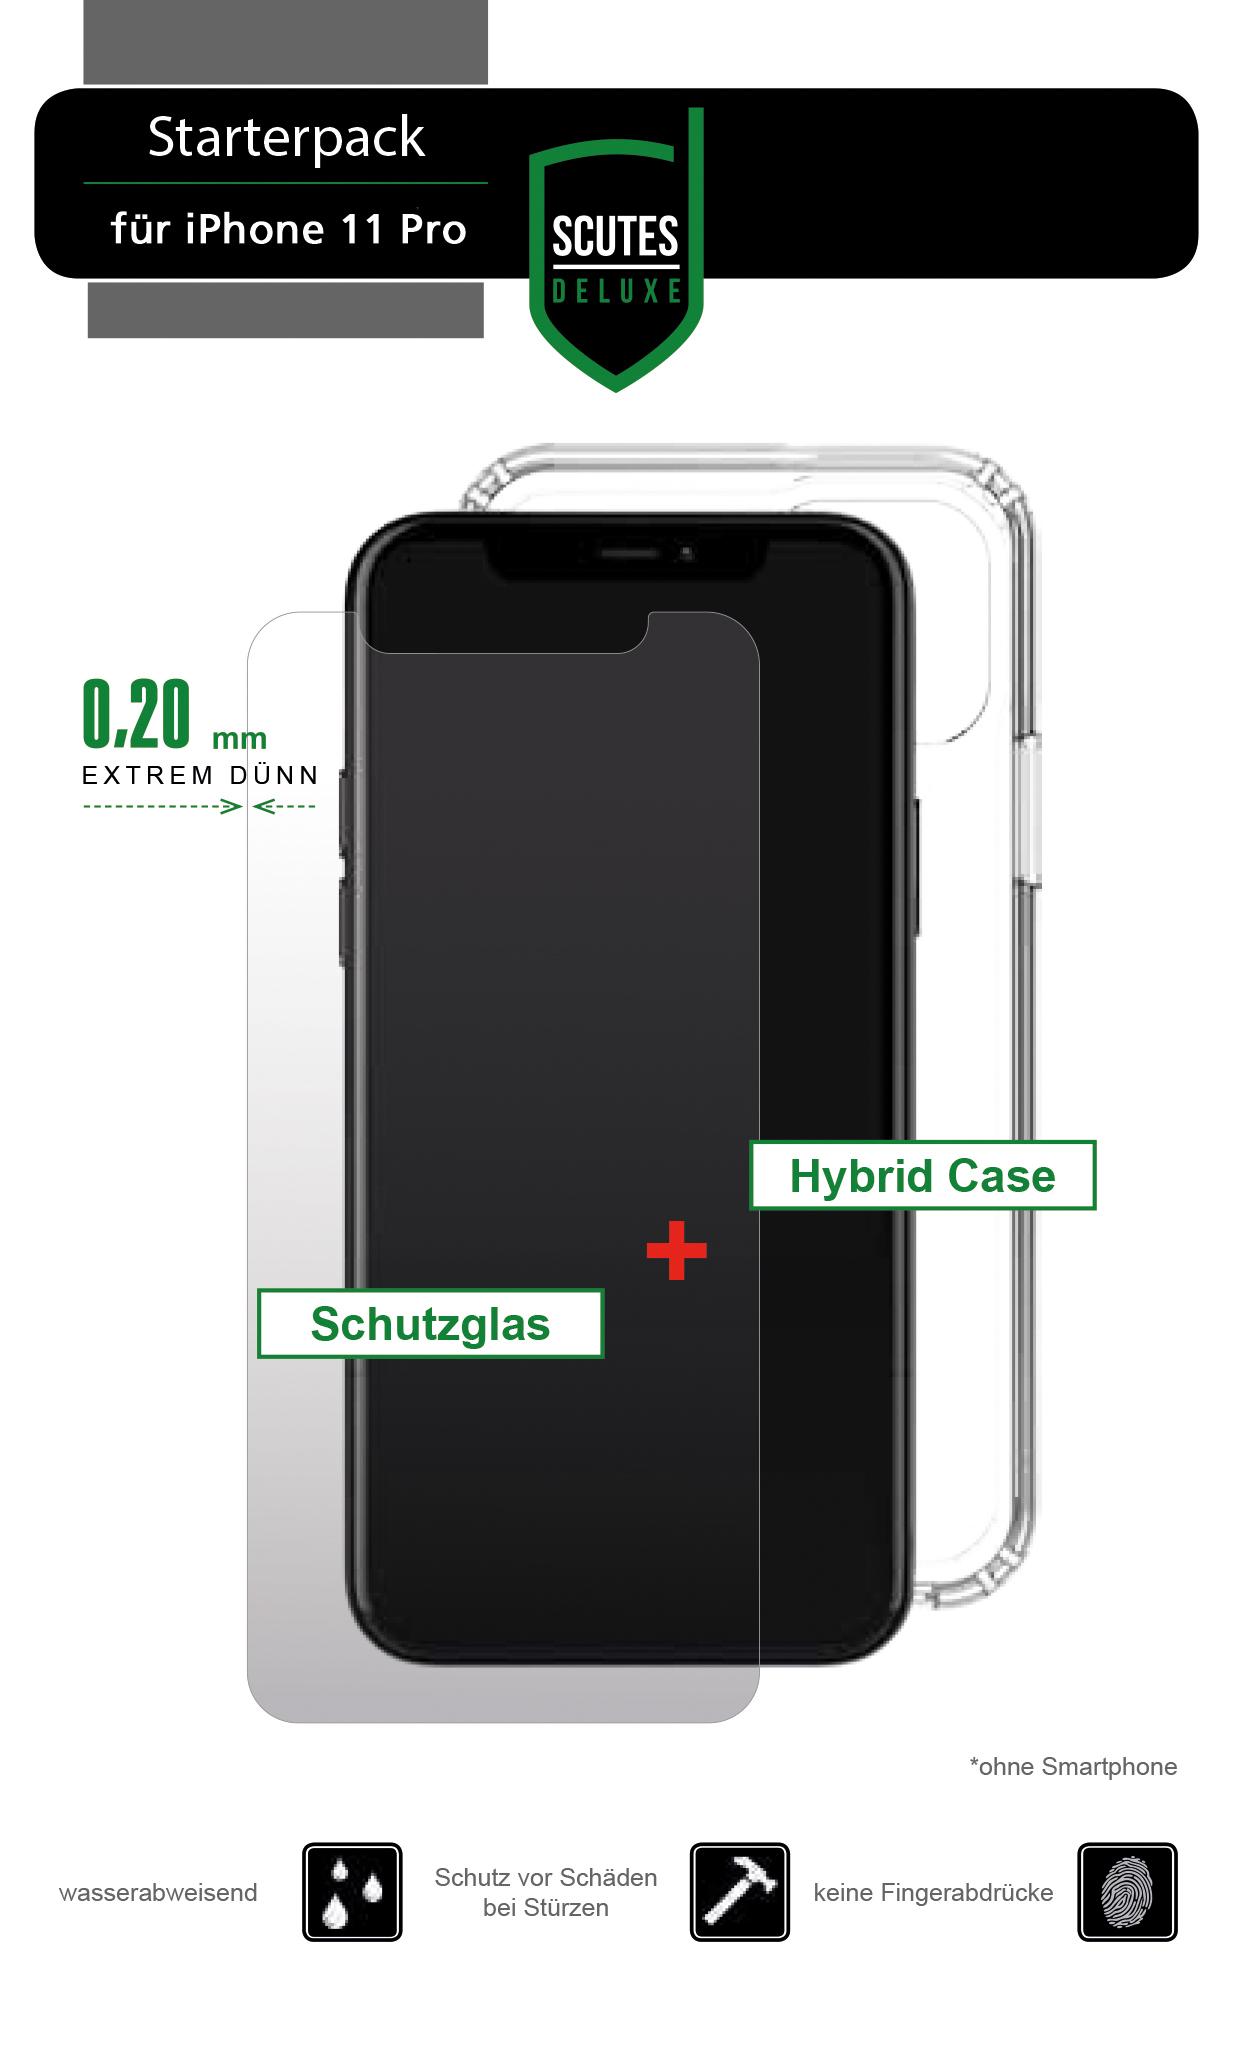 Starterpack (iPhone 11 Pro)